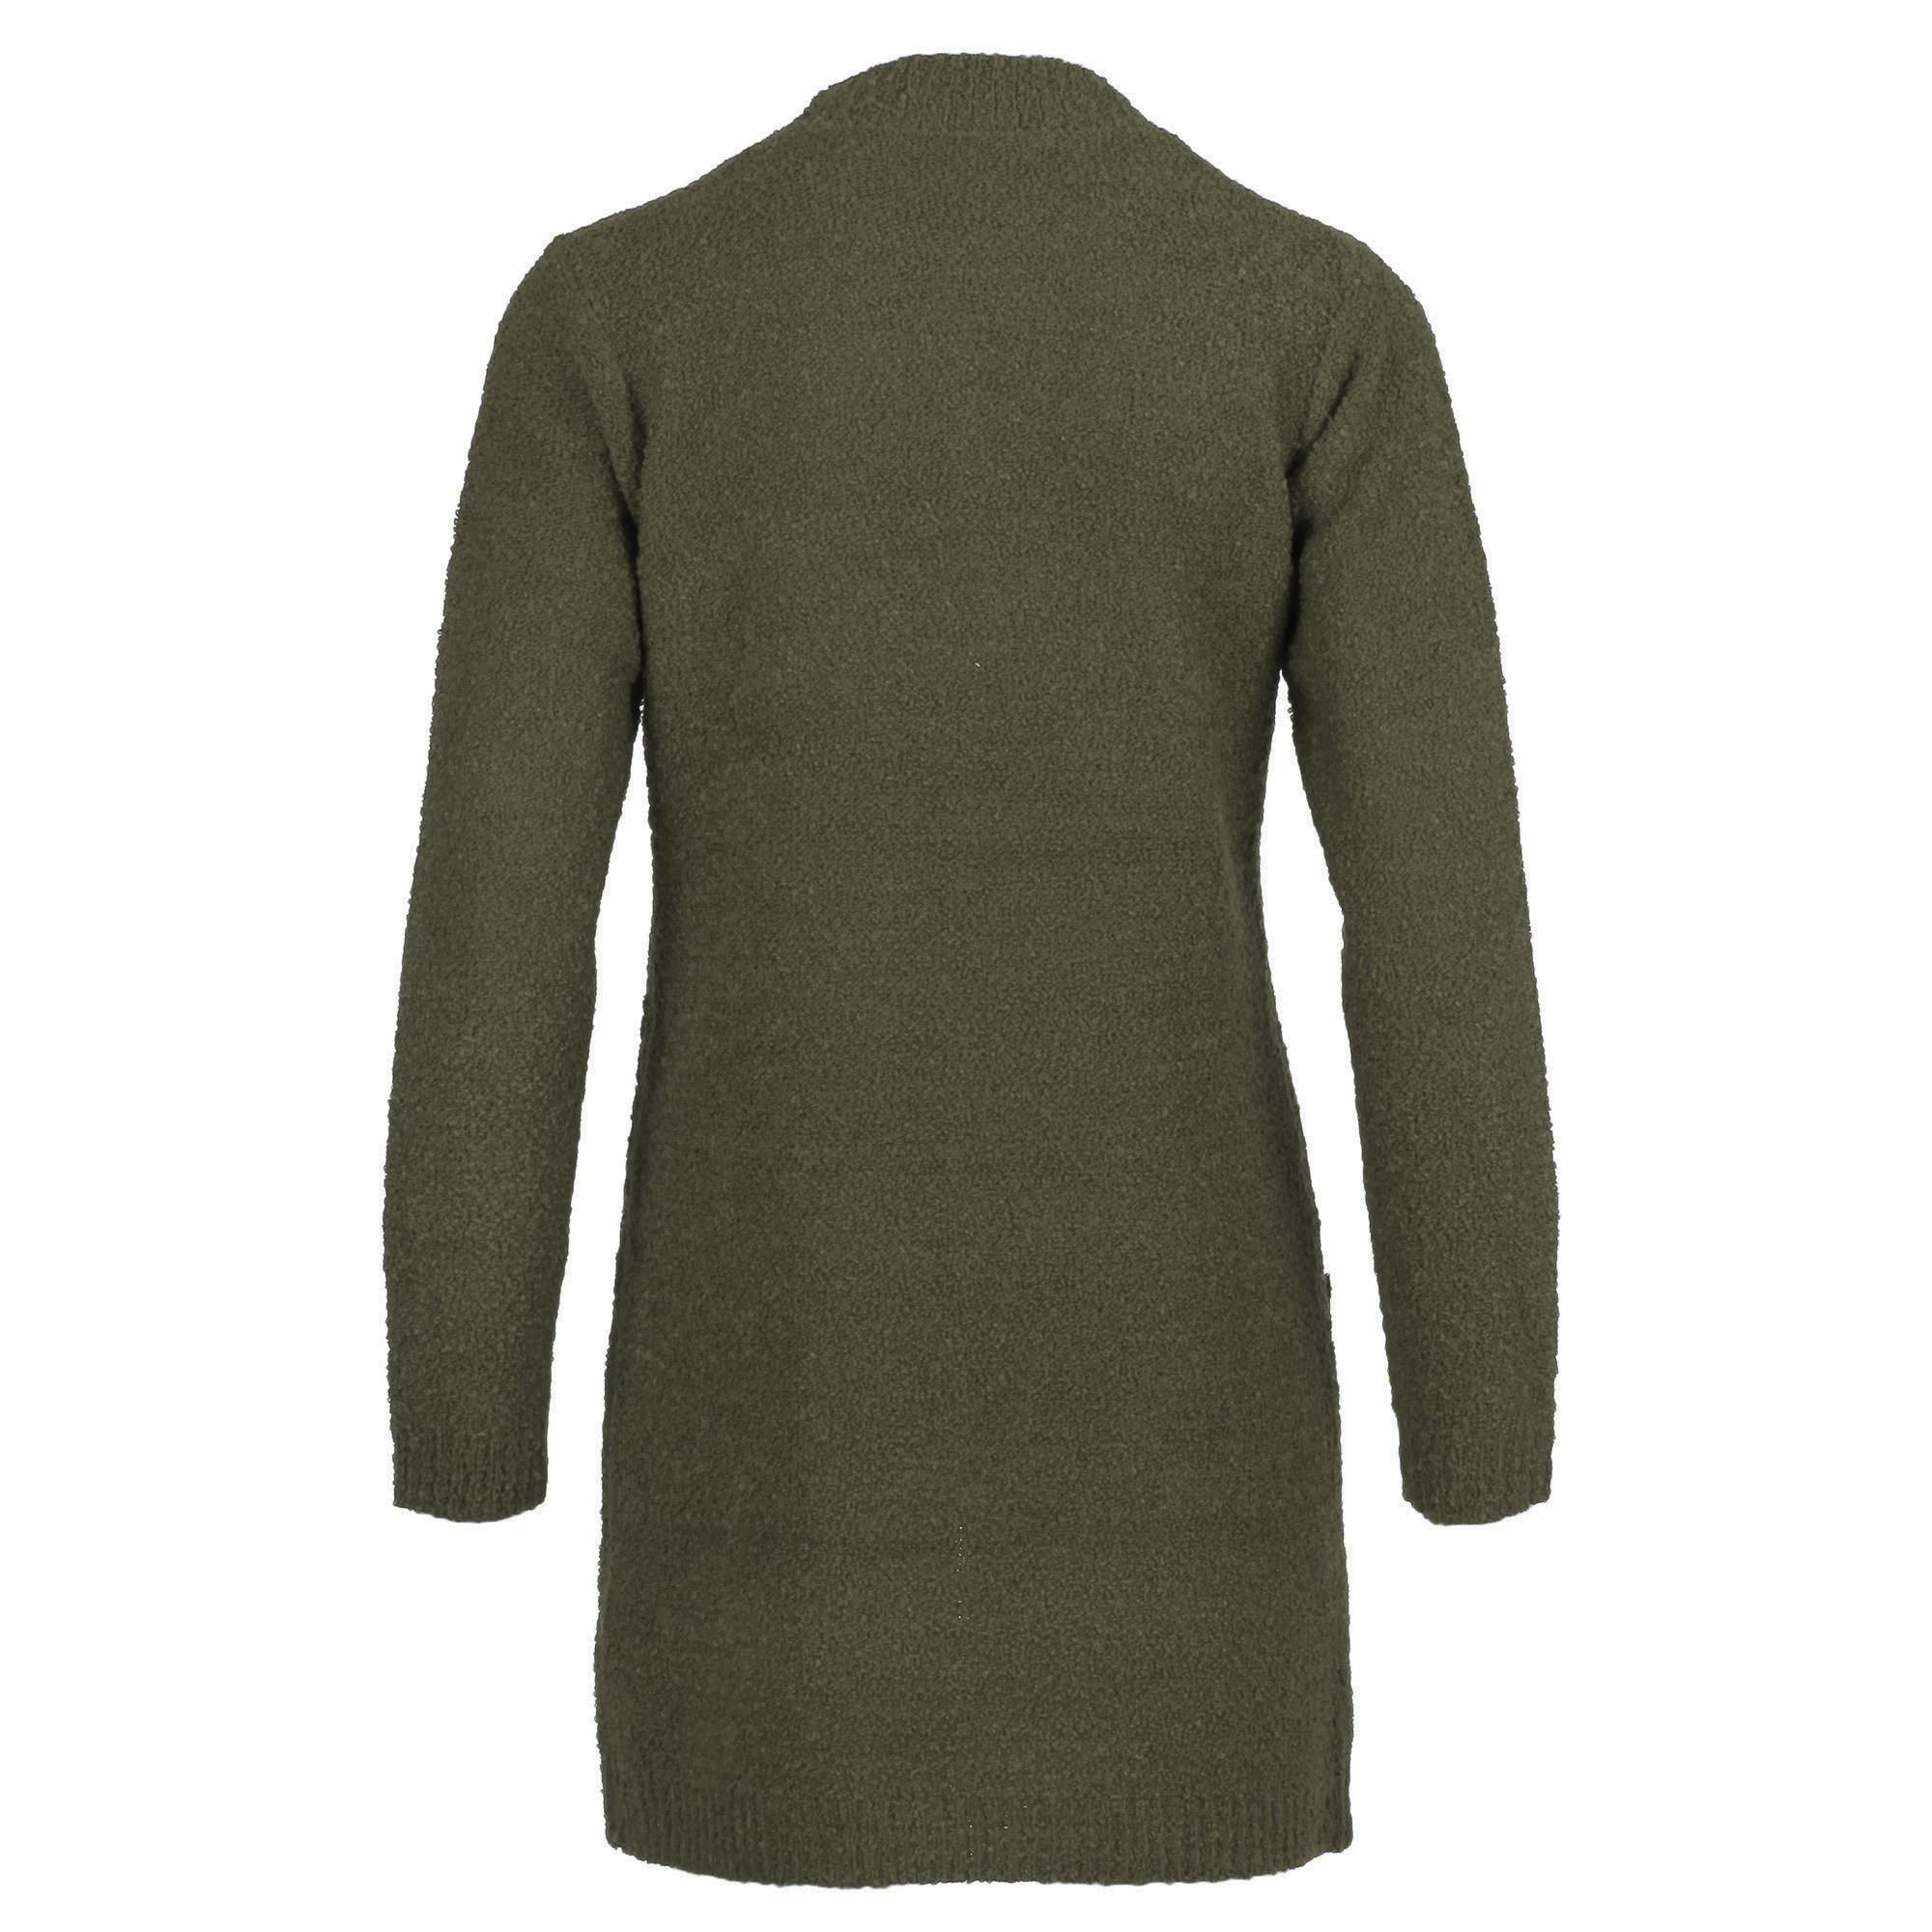 Enjoy Dames Vest Boucle Zakken 421896-7